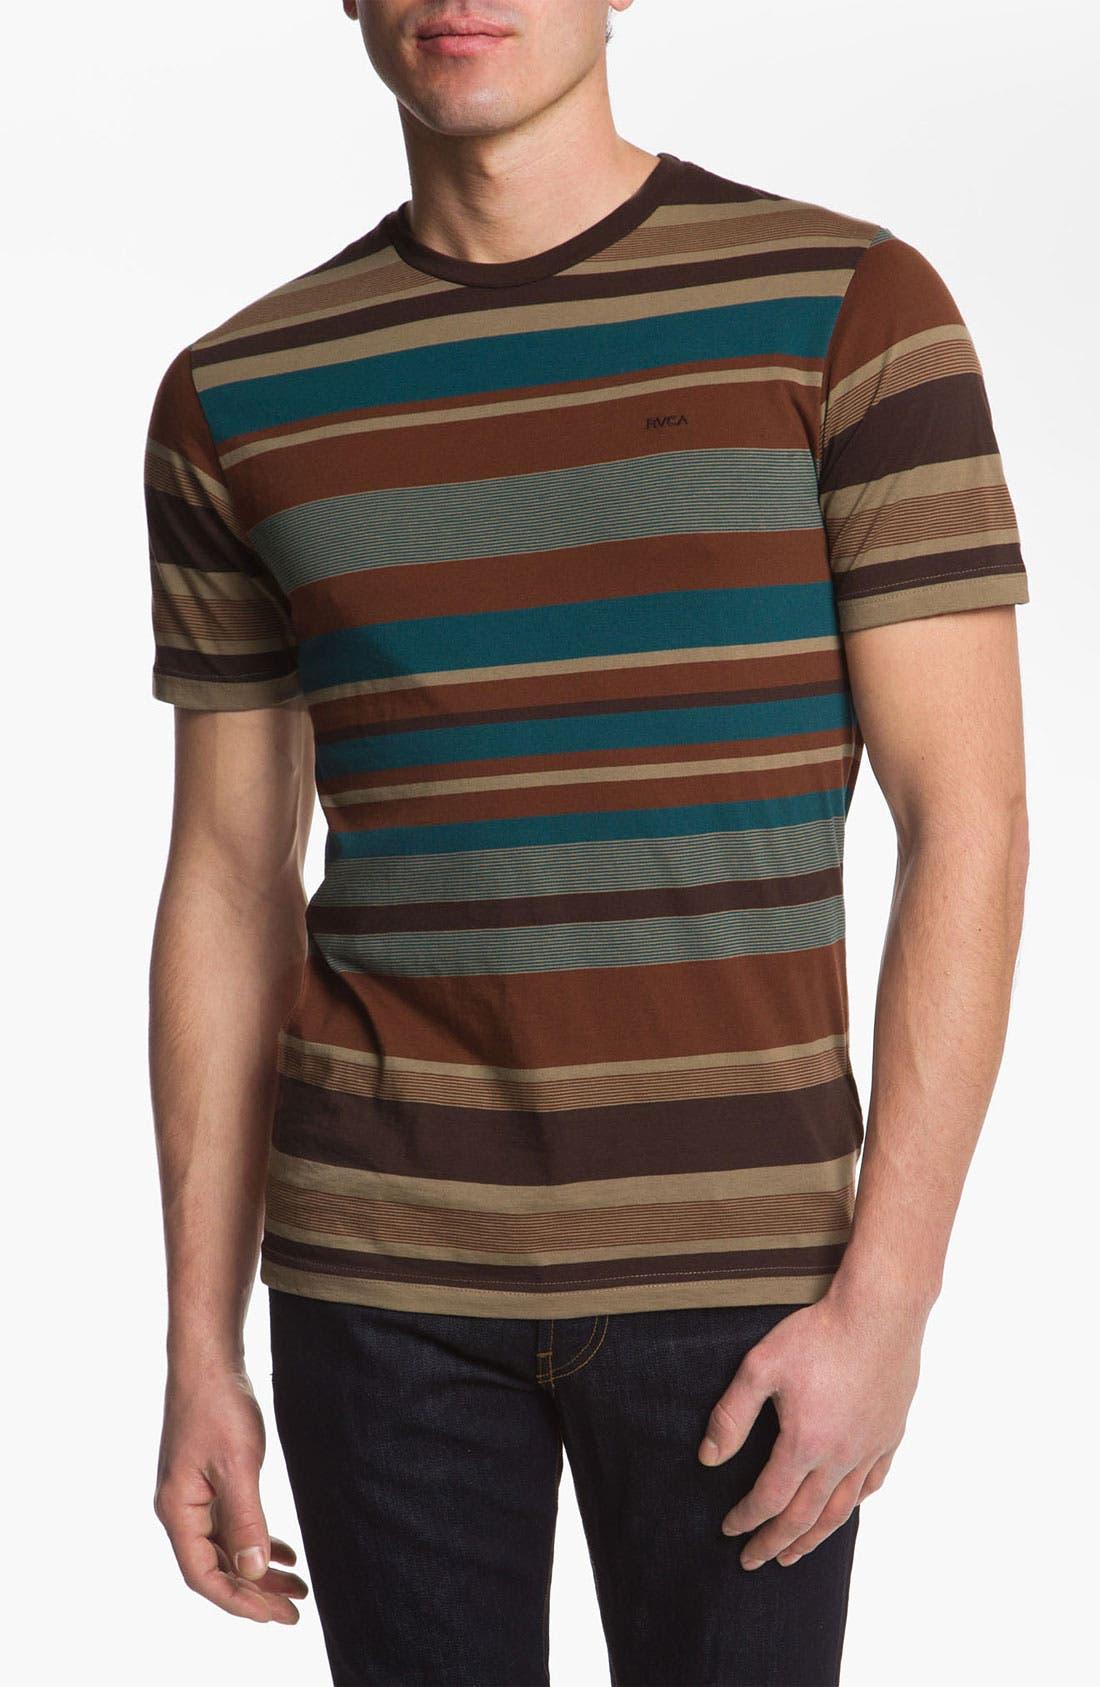 Alternate Image 1 Selected - RVCA 'Adirondack' Short Sleeve Jersey T-Shirt